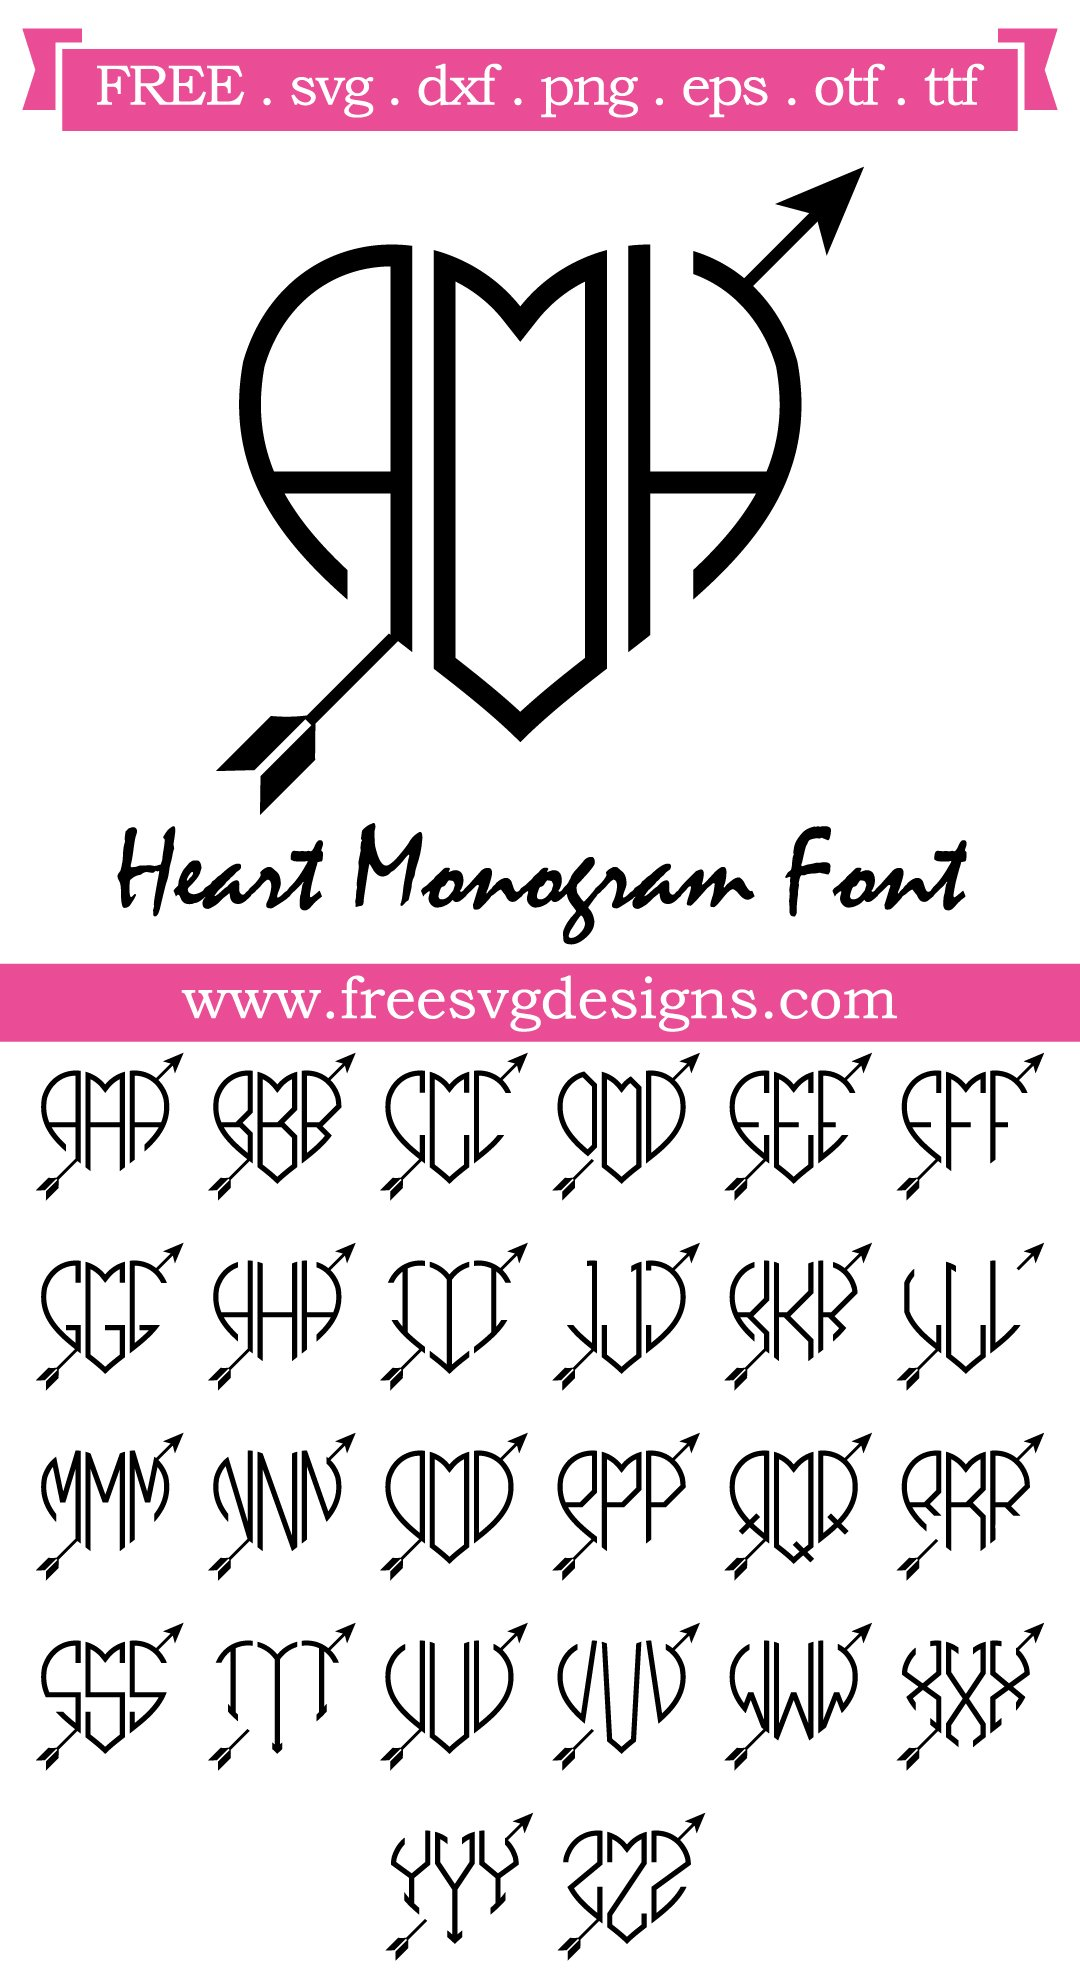 Heart Monogram Font SVG